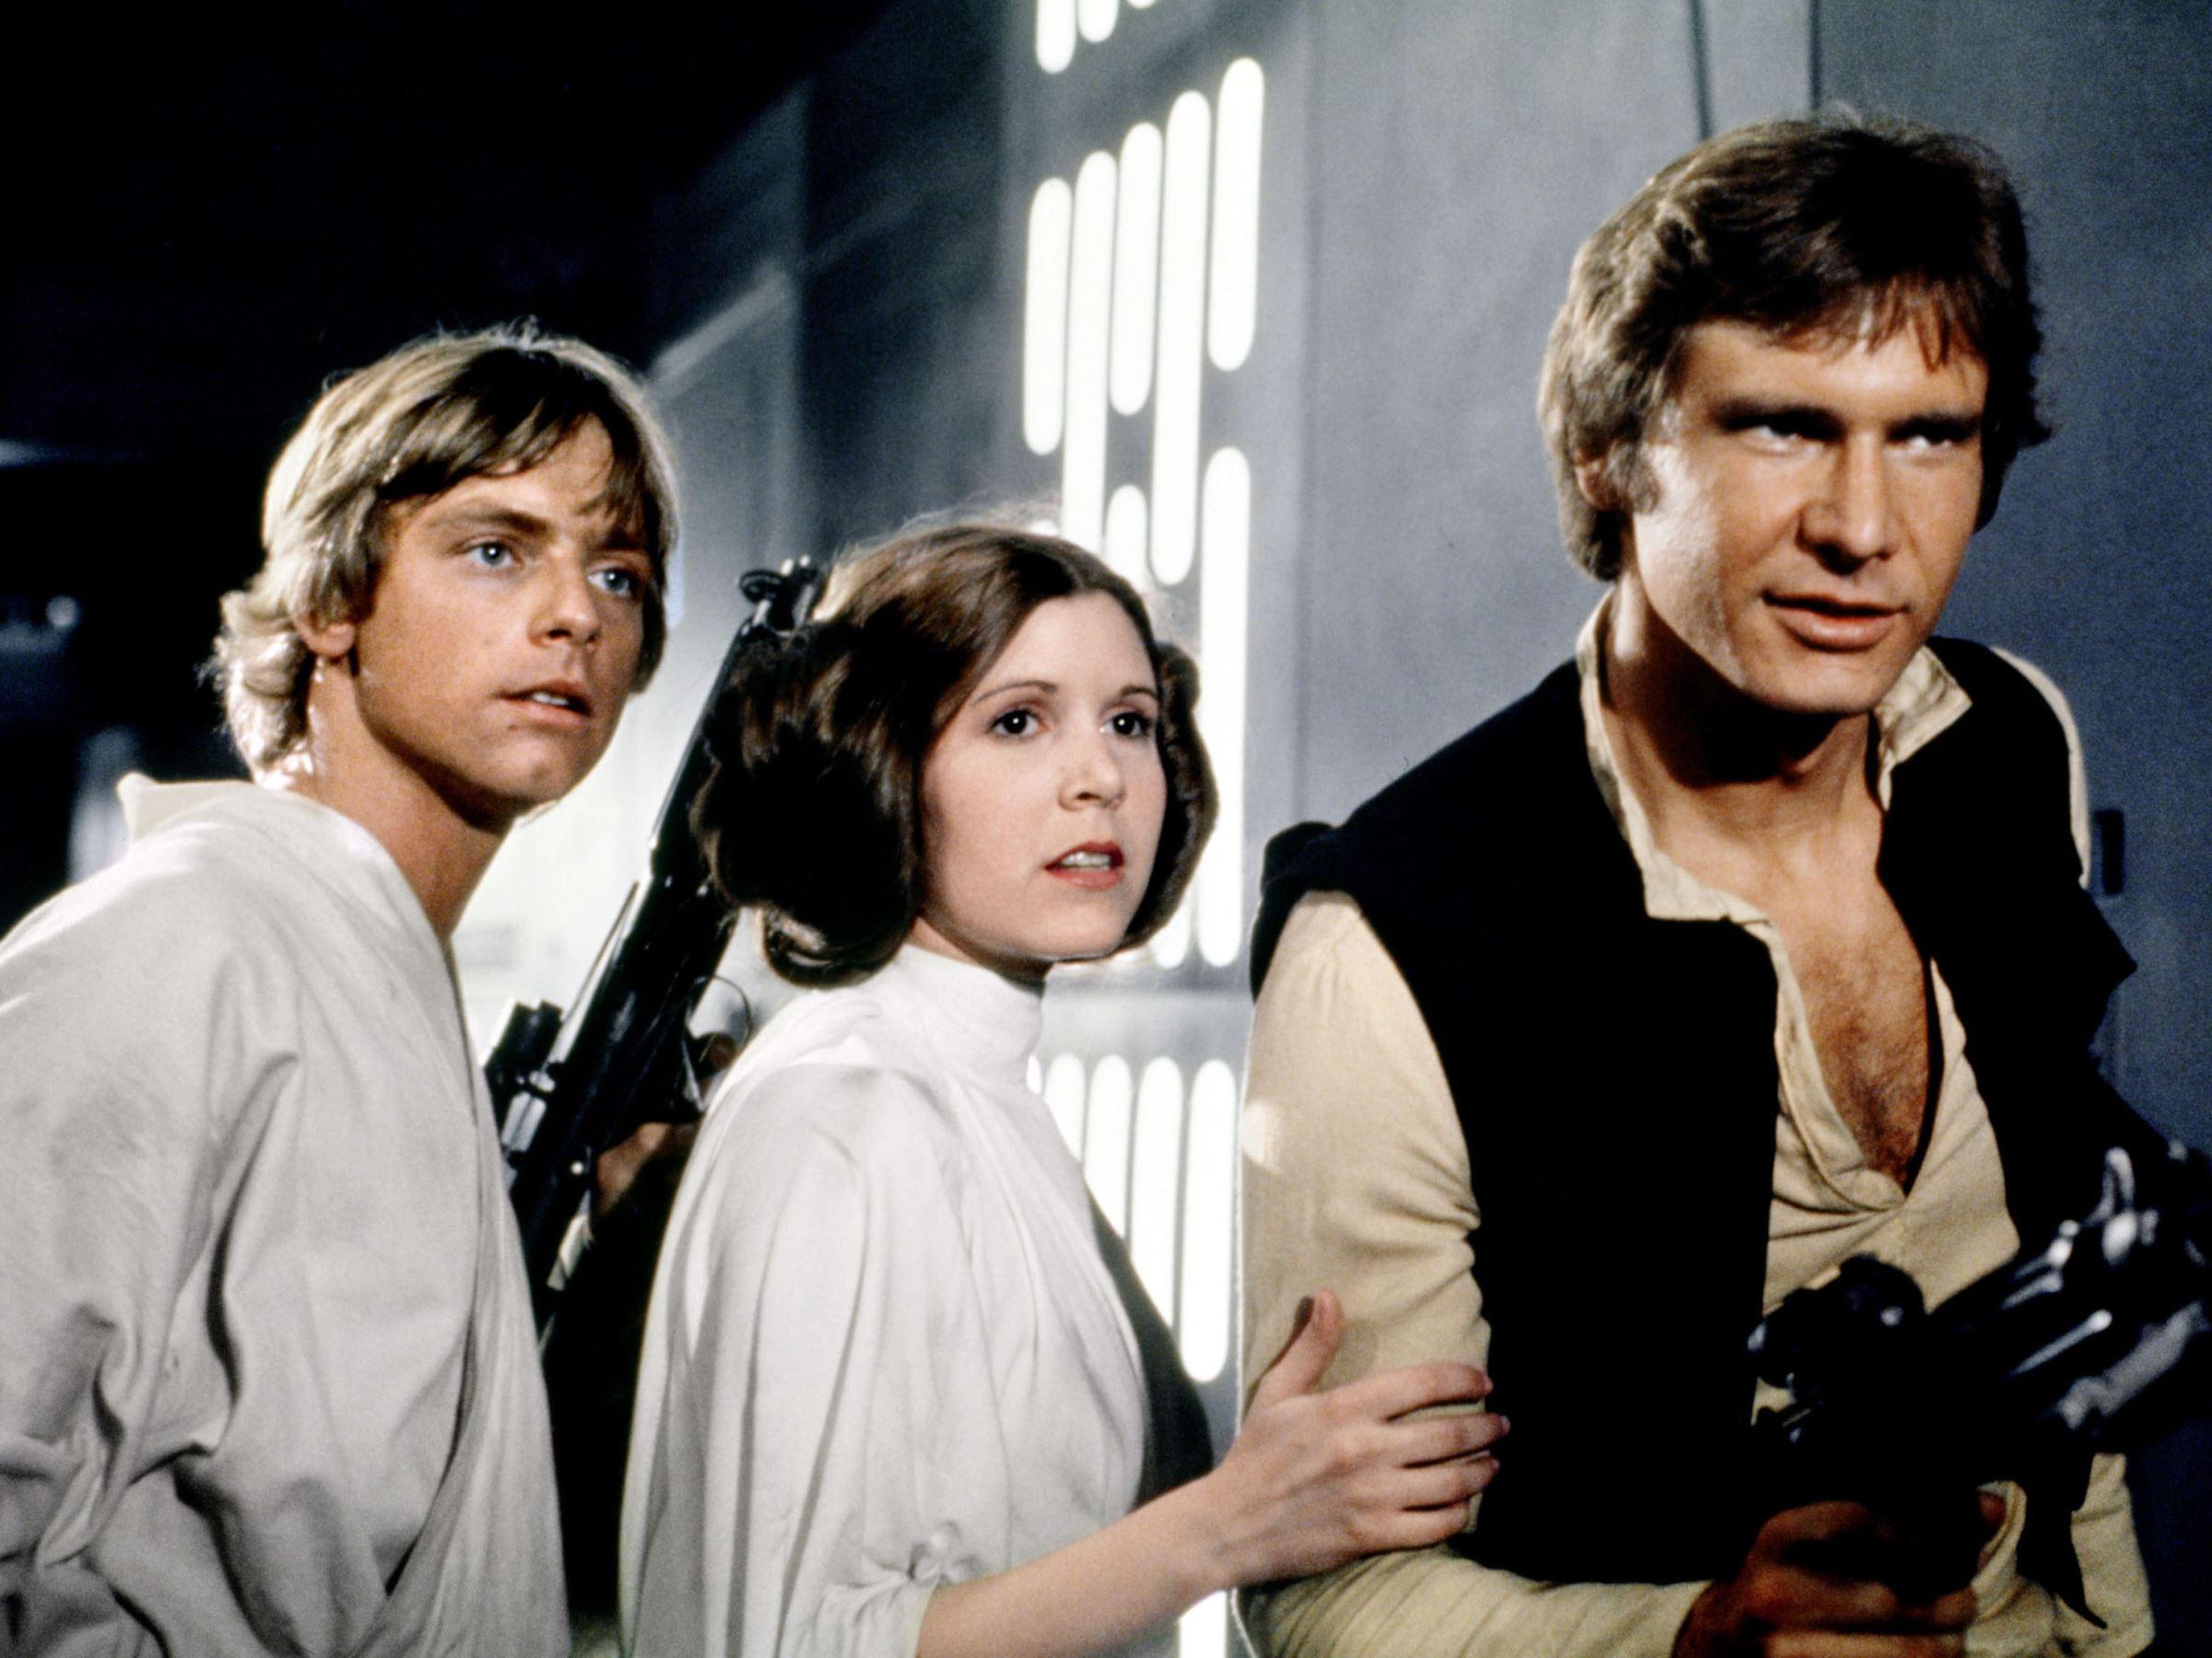 25-mai-1977-jour-star-wars-est-sorti-cinema.jpg